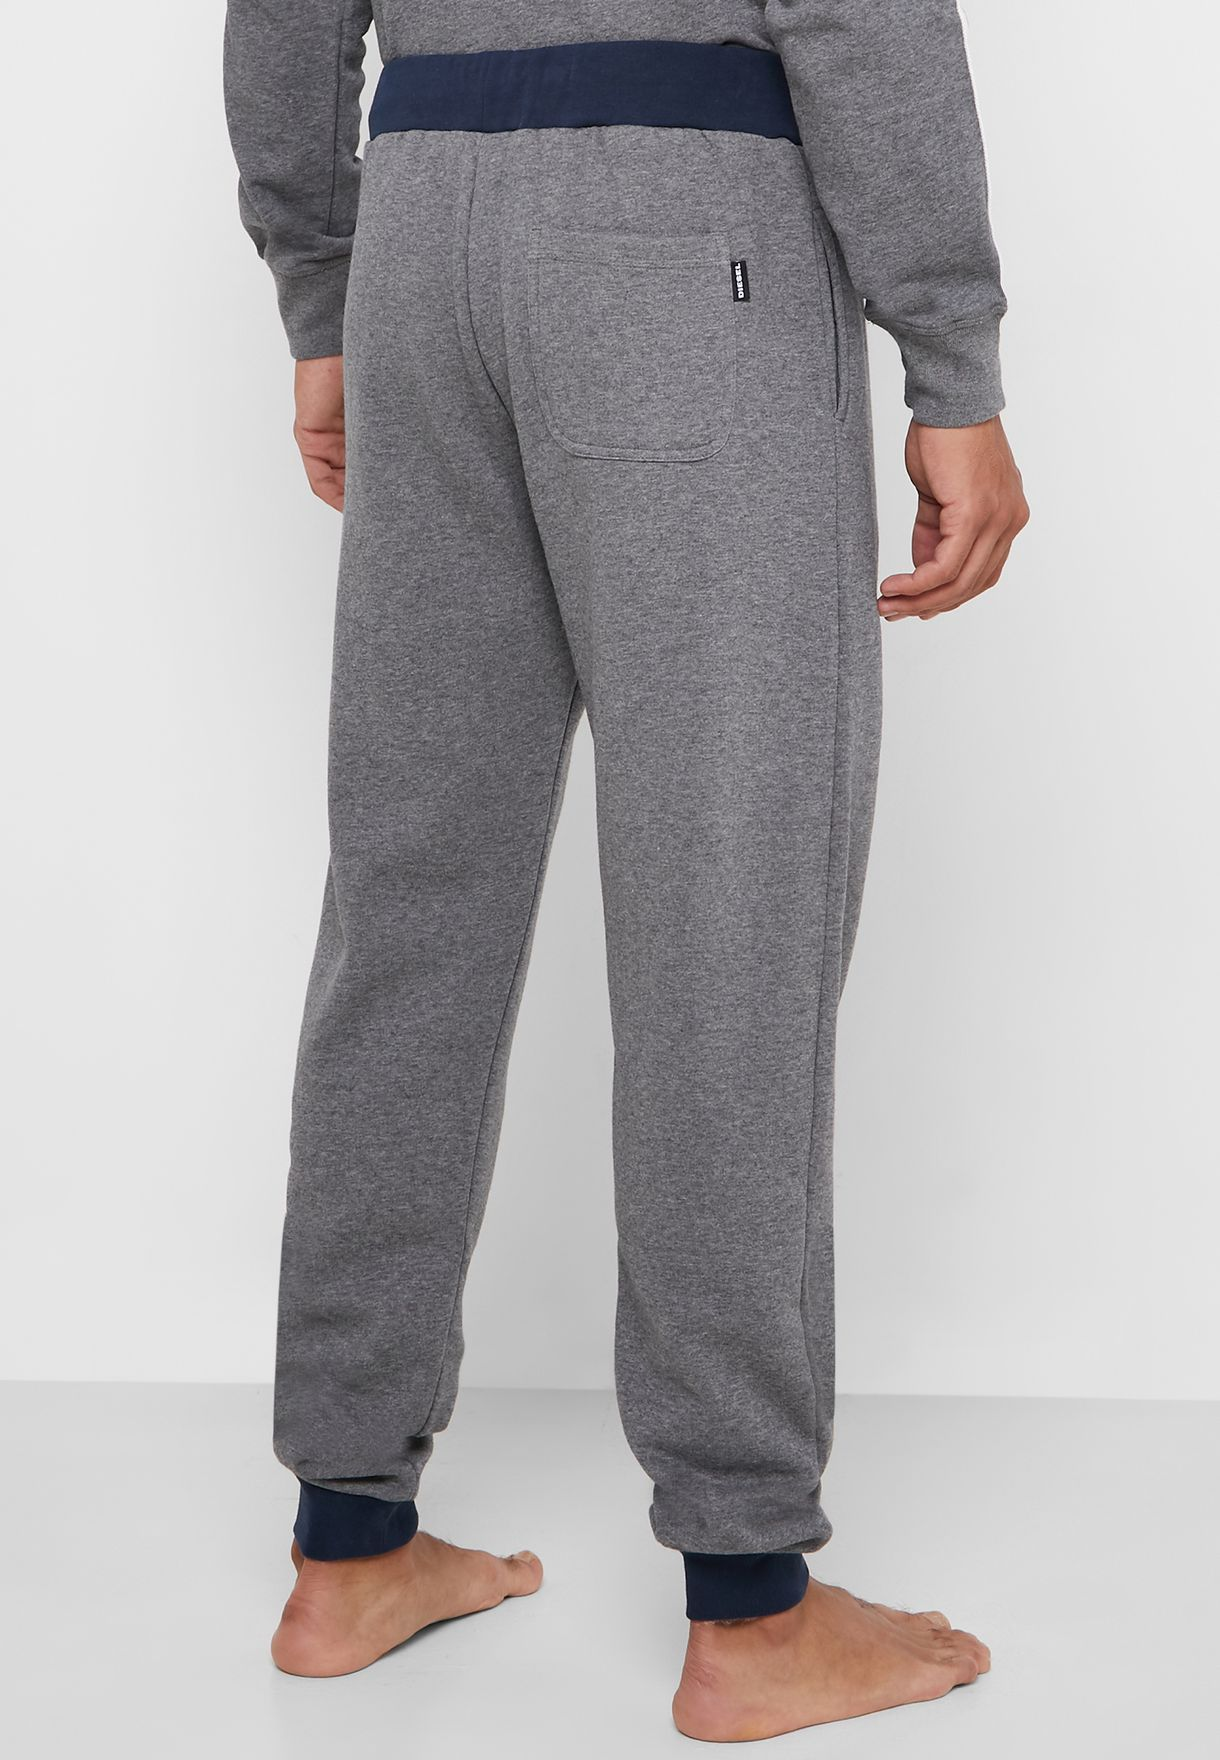 Peter Lounge Sweatpants